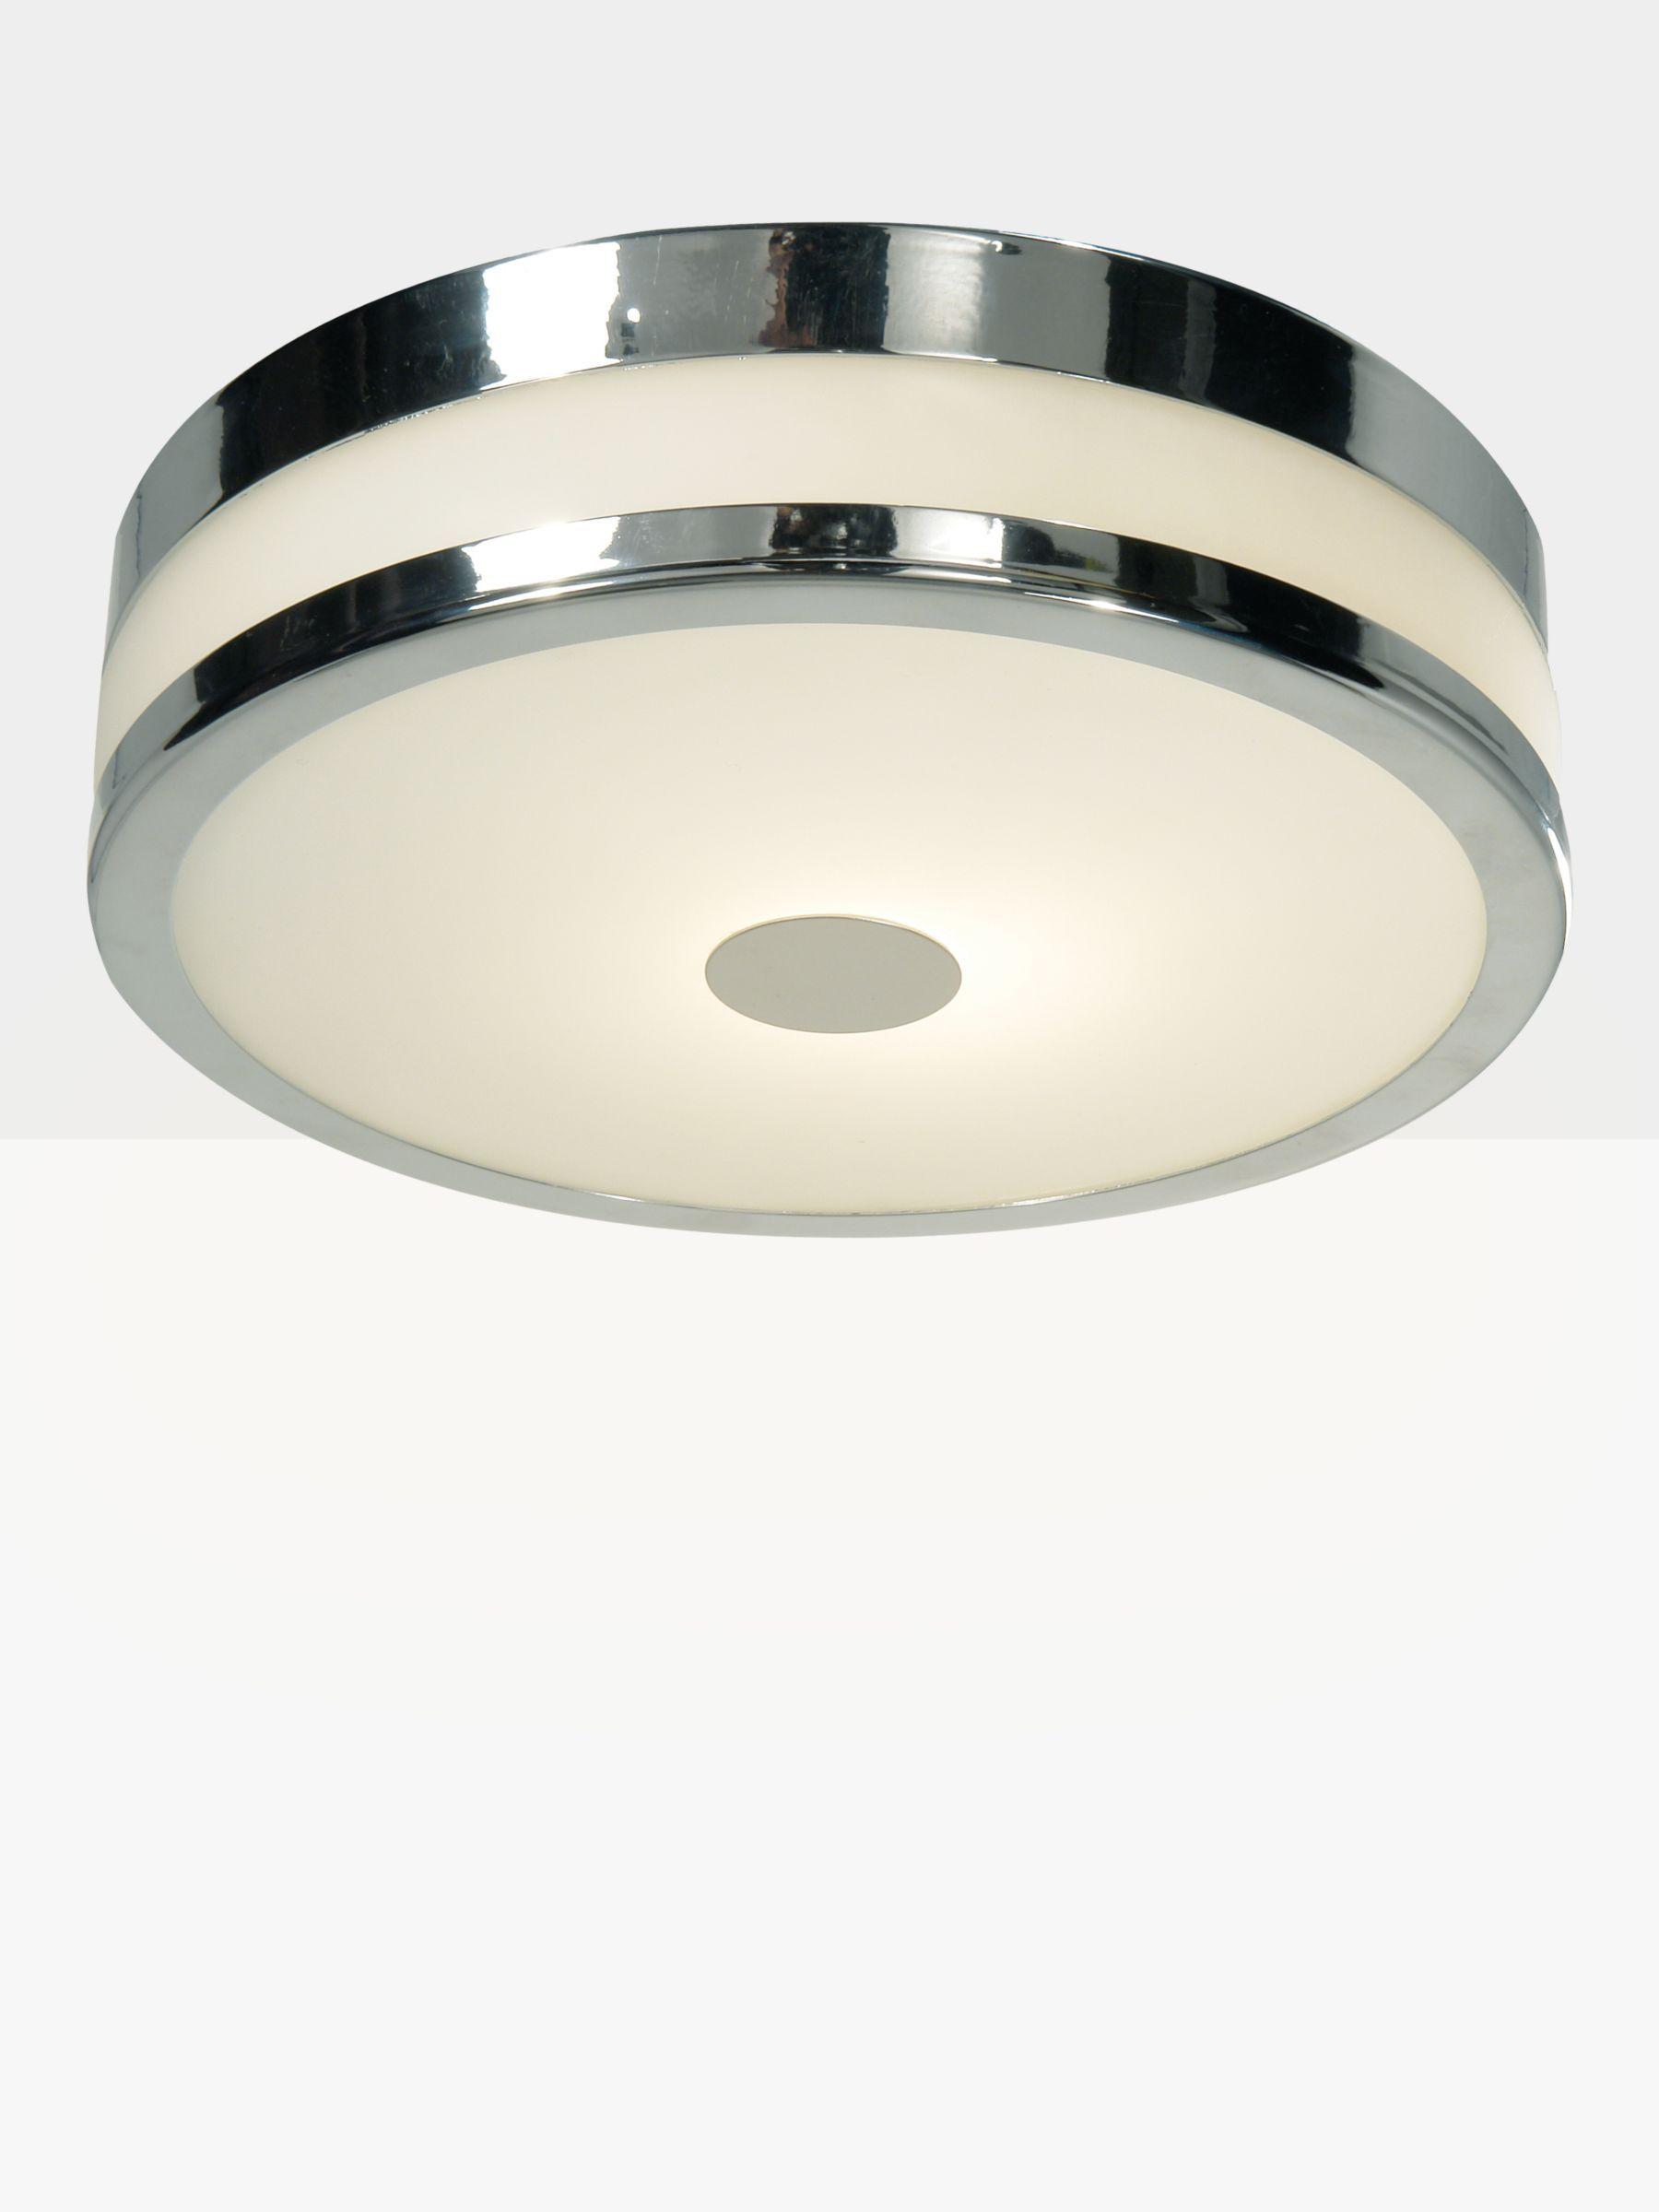 John Lewis Partners Shiko Bathroom Ceiling Light Bathroom Light Fittings Bathroom Ceiling Light Bathroom Light Fixtures Ceiling